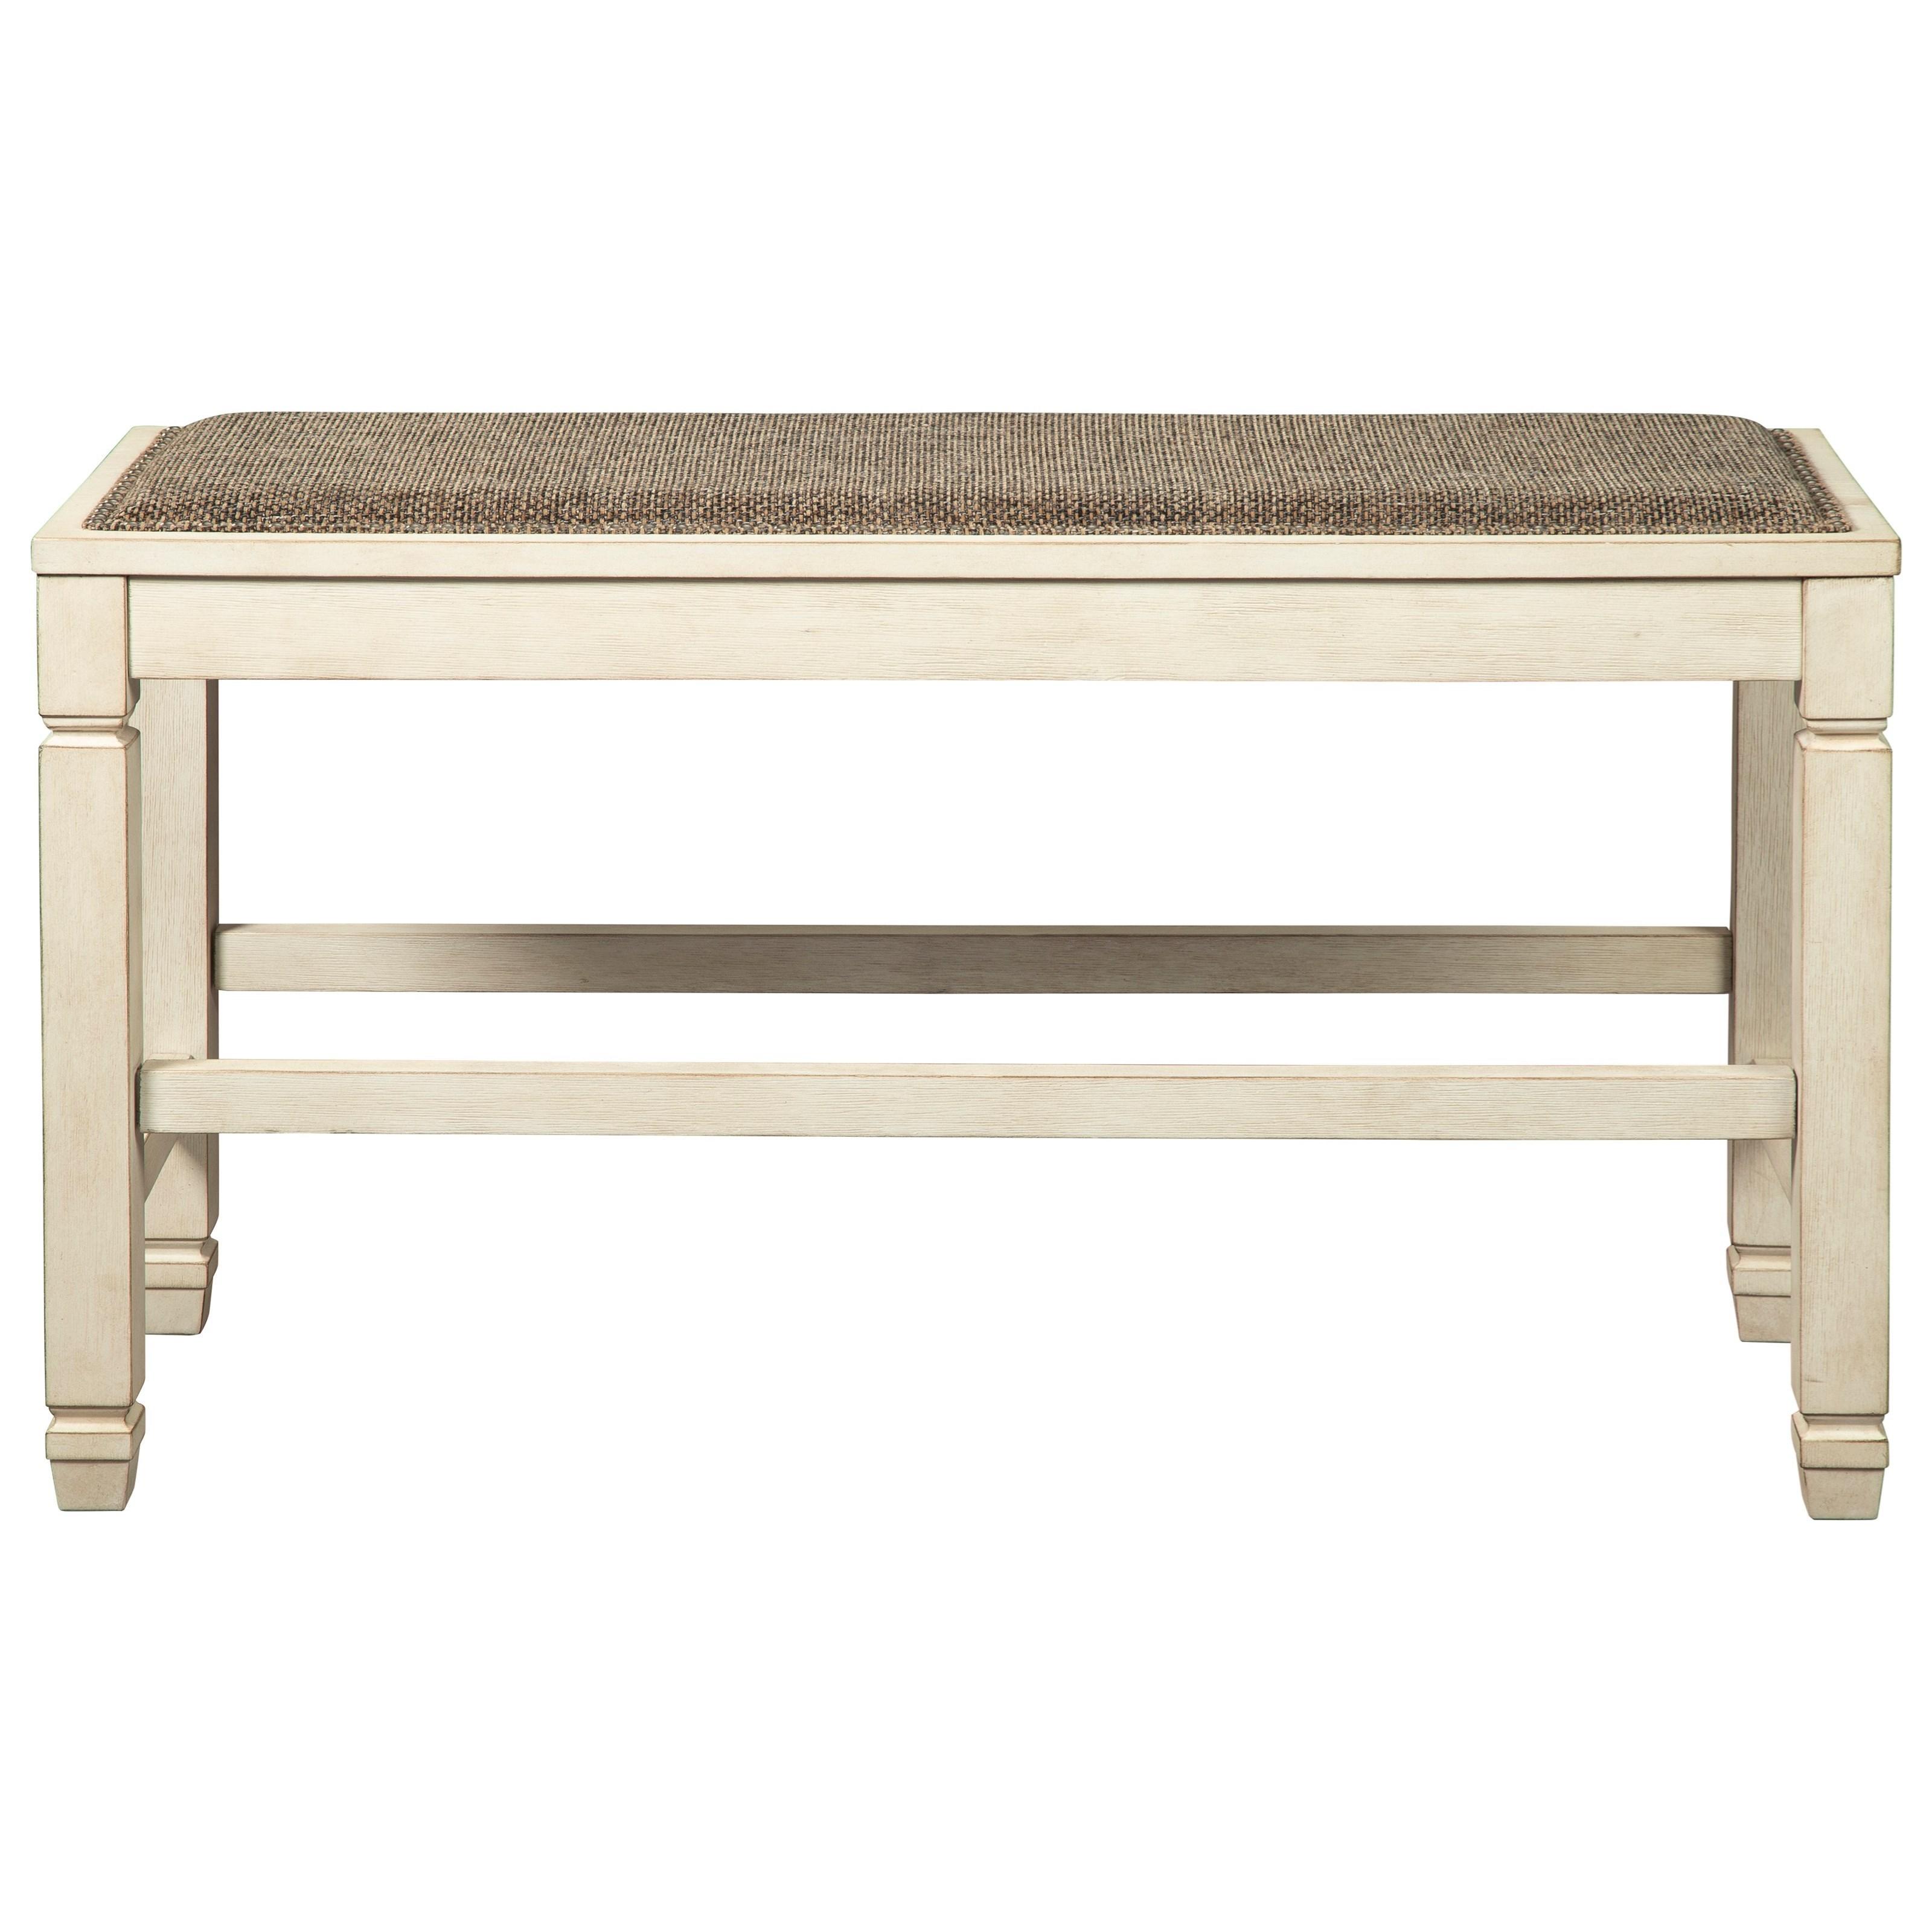 Bolanburg Double Counter Upholstered Bench by Ashley (Signature Design) at Johnny Janosik